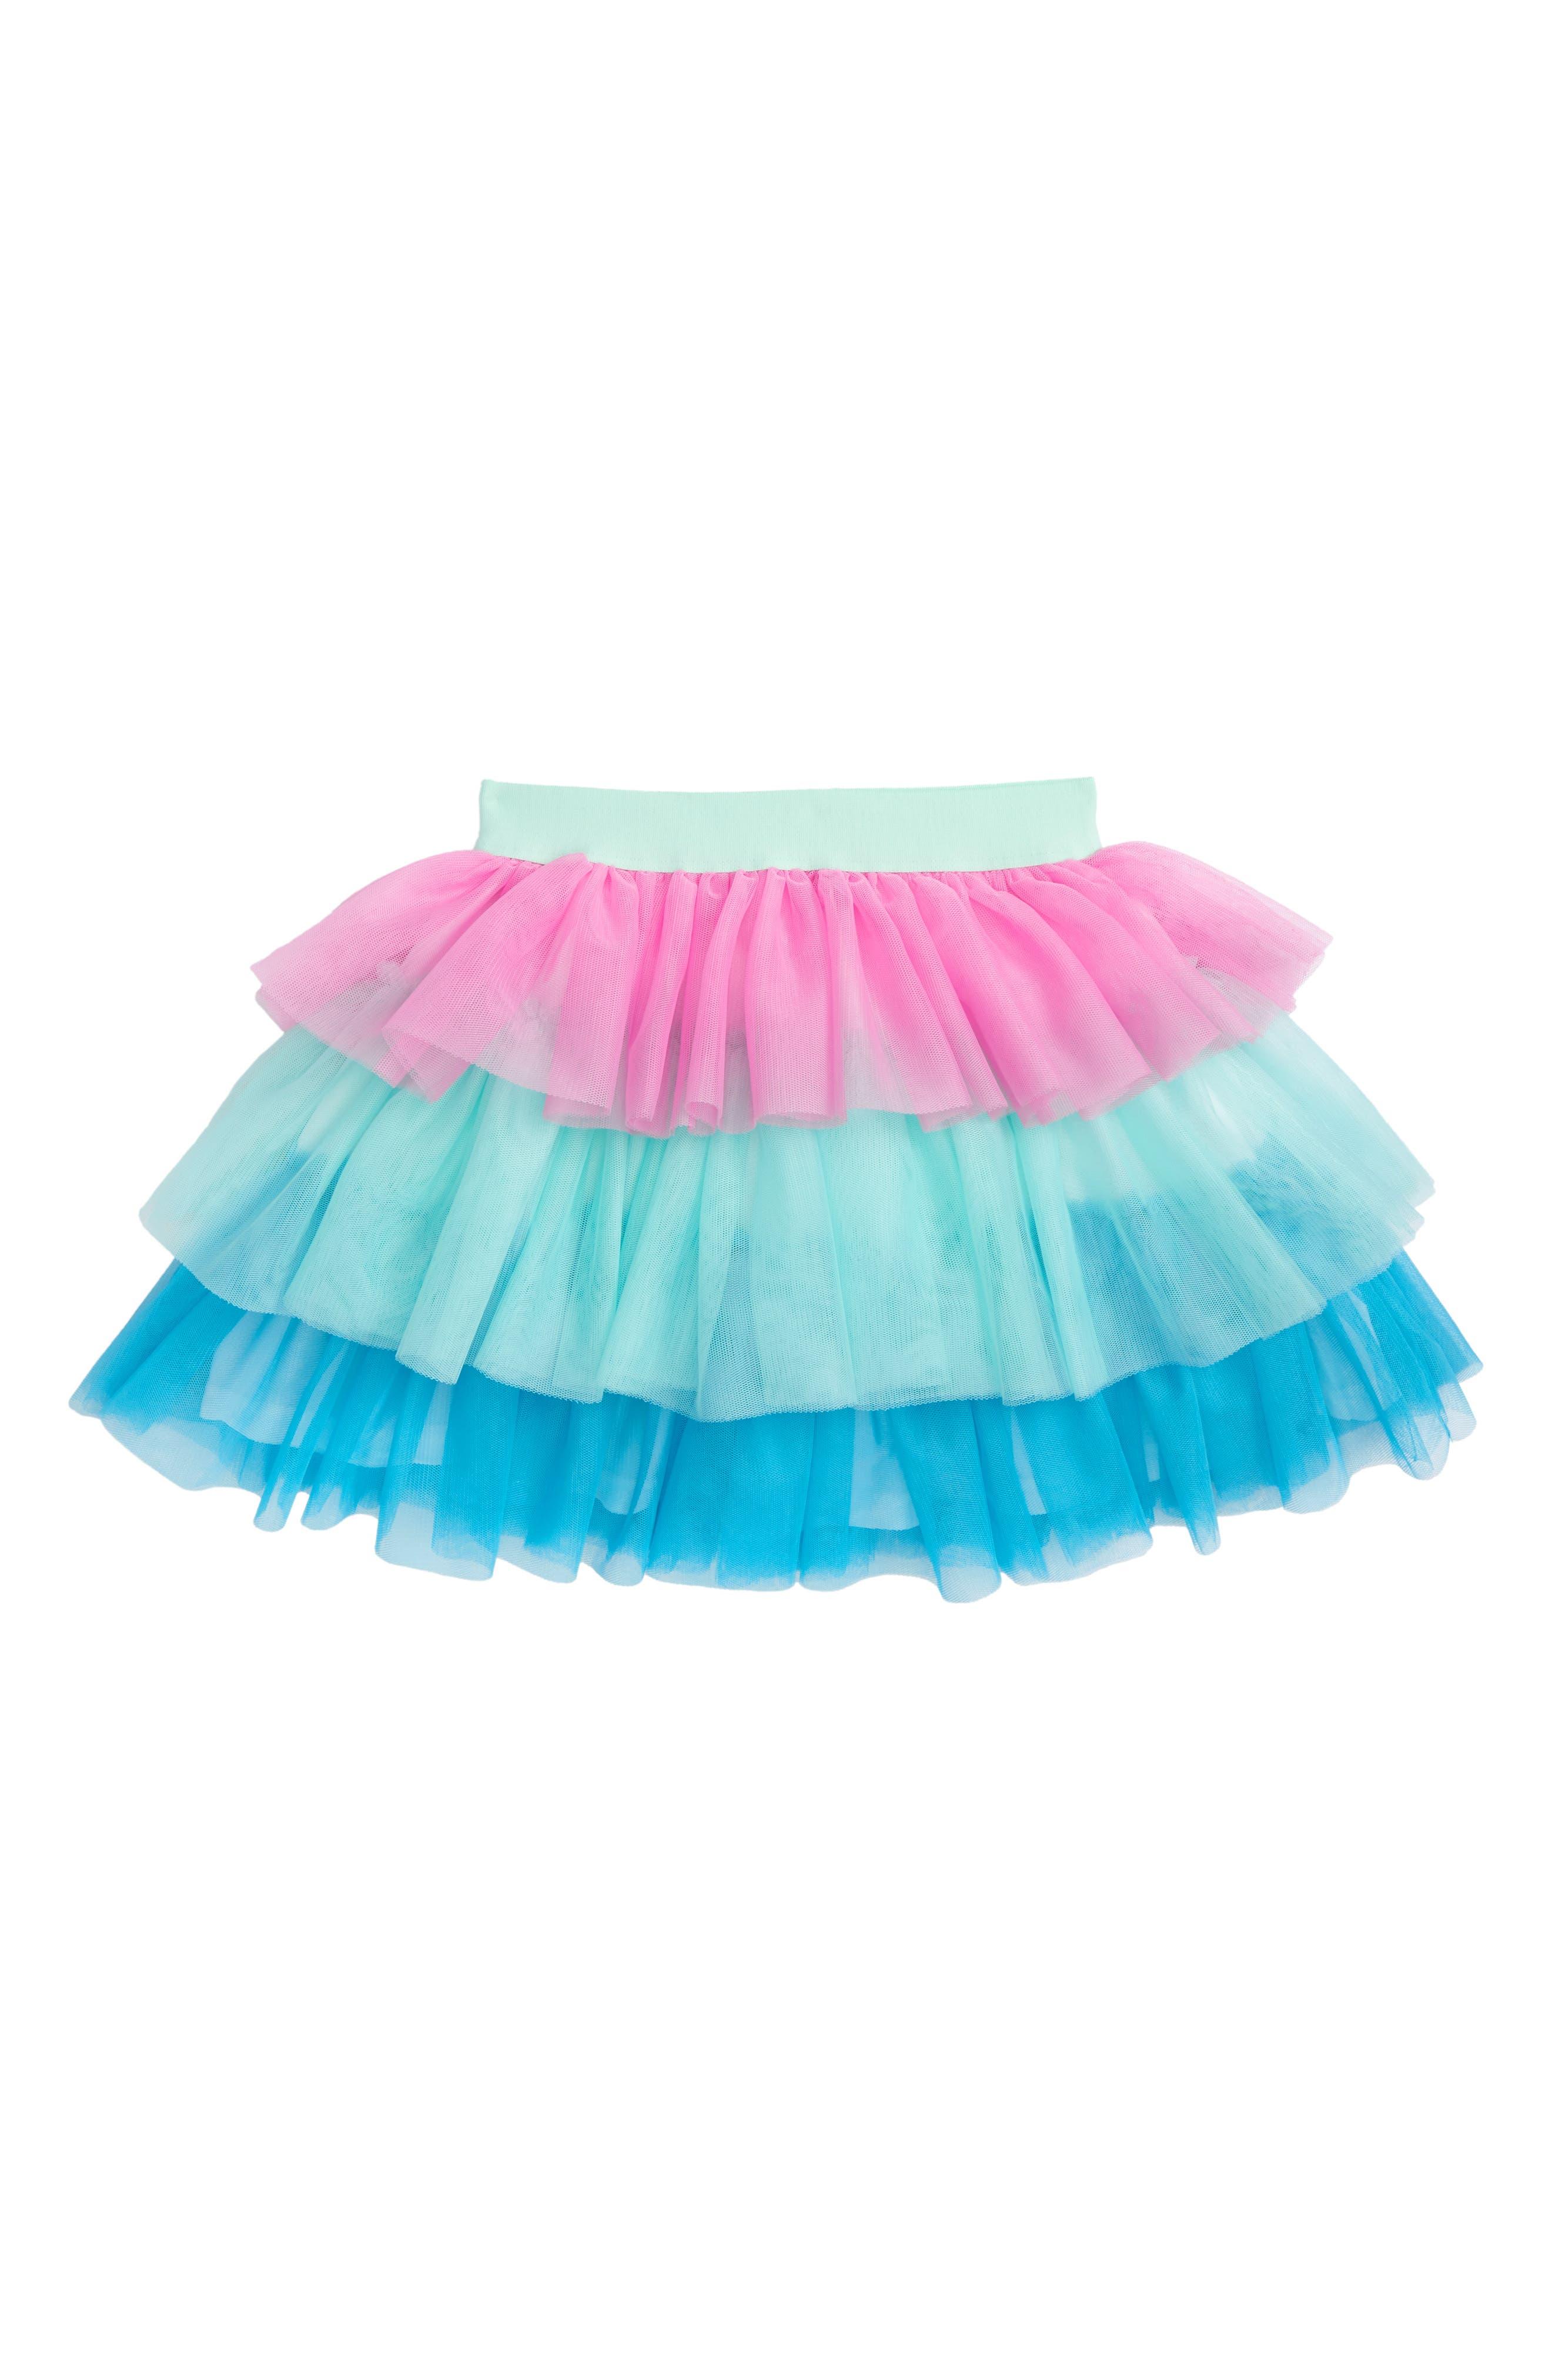 Colorblock Tiered Tulle Skirt,                             Main thumbnail 1, color,                             Aqua Multi